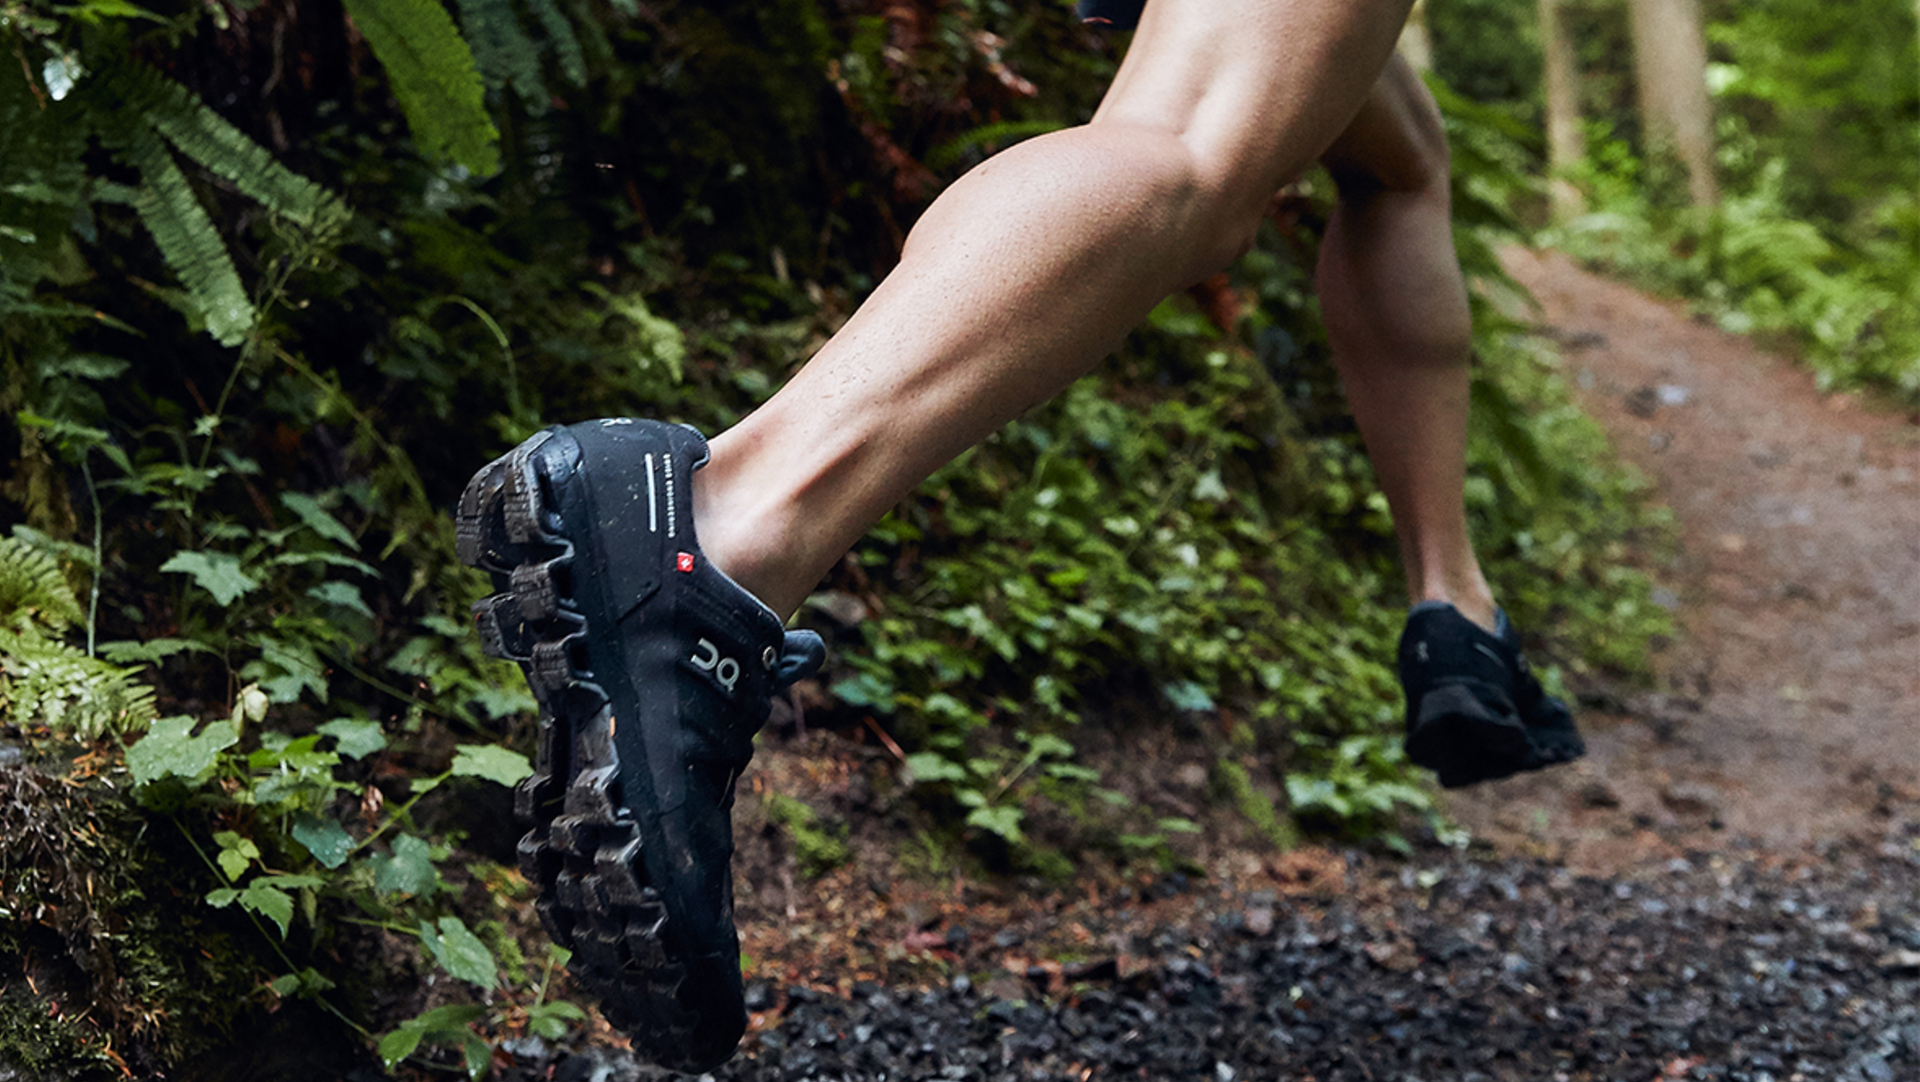 On Cloudventure Waterproof Black Graphite action sole